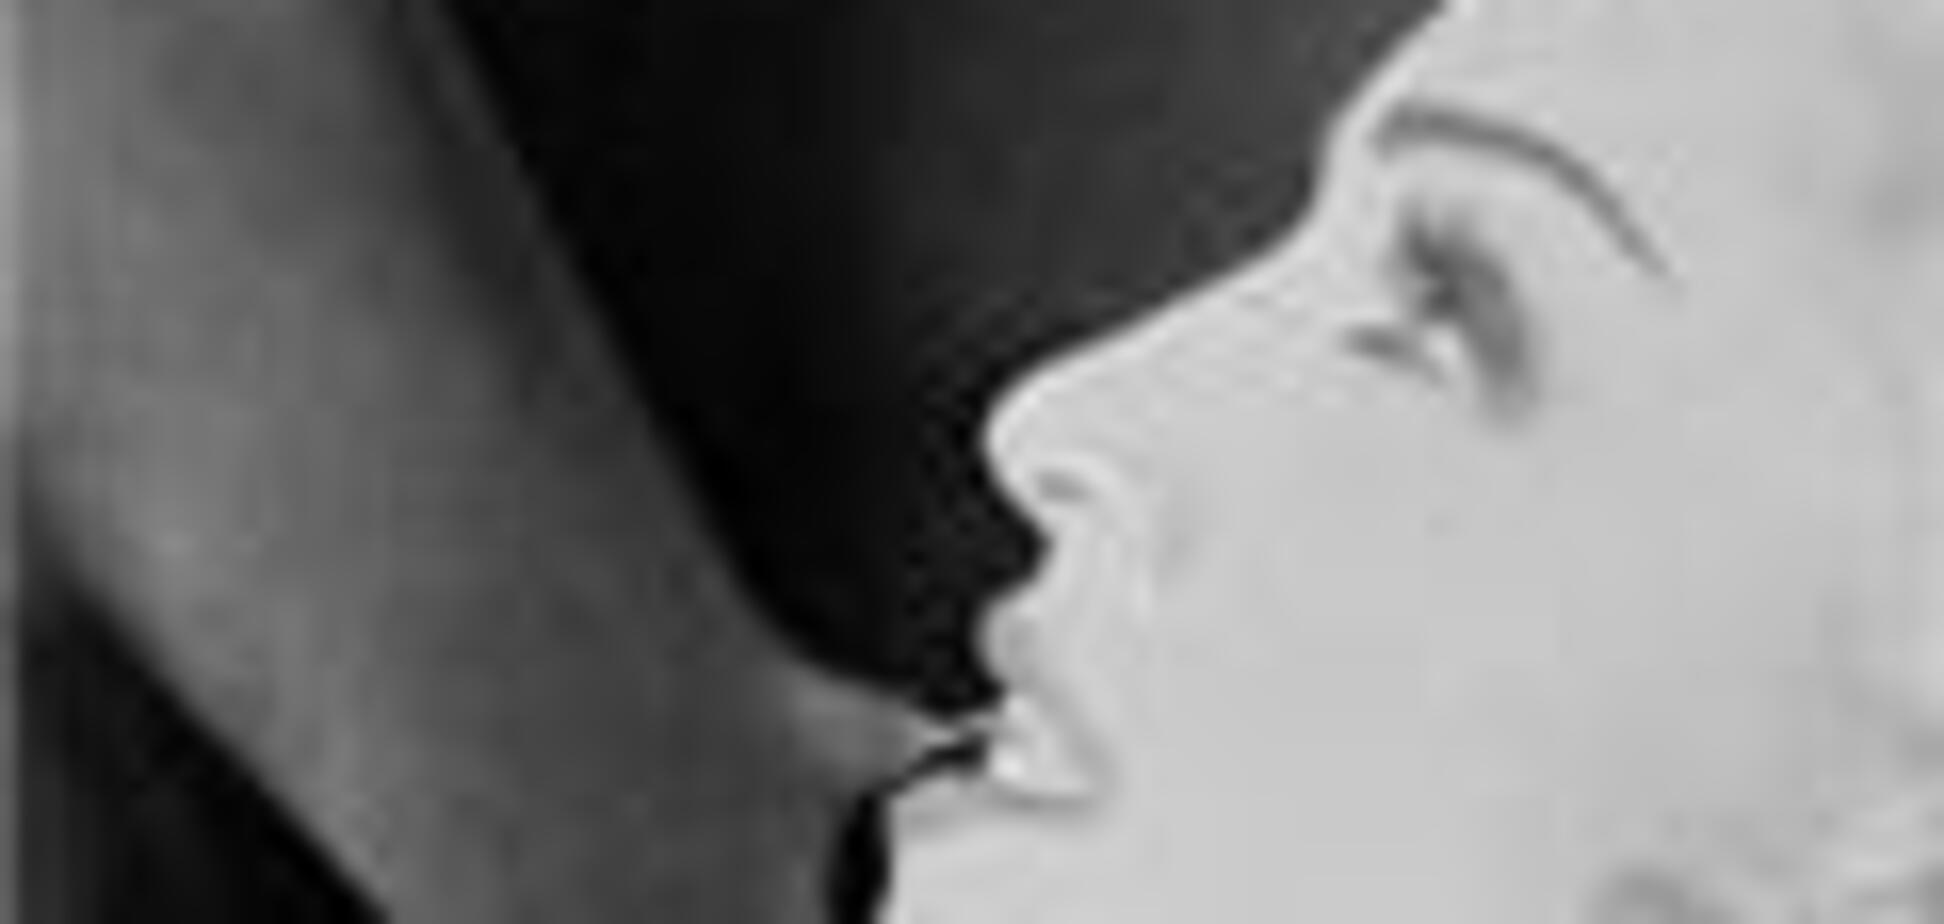 'Секс' - скандальна книга Мадонни